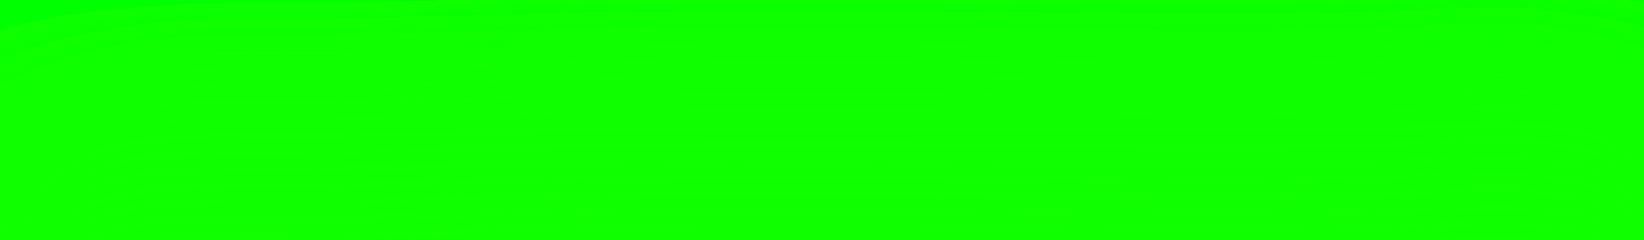 green kpop freetoedit